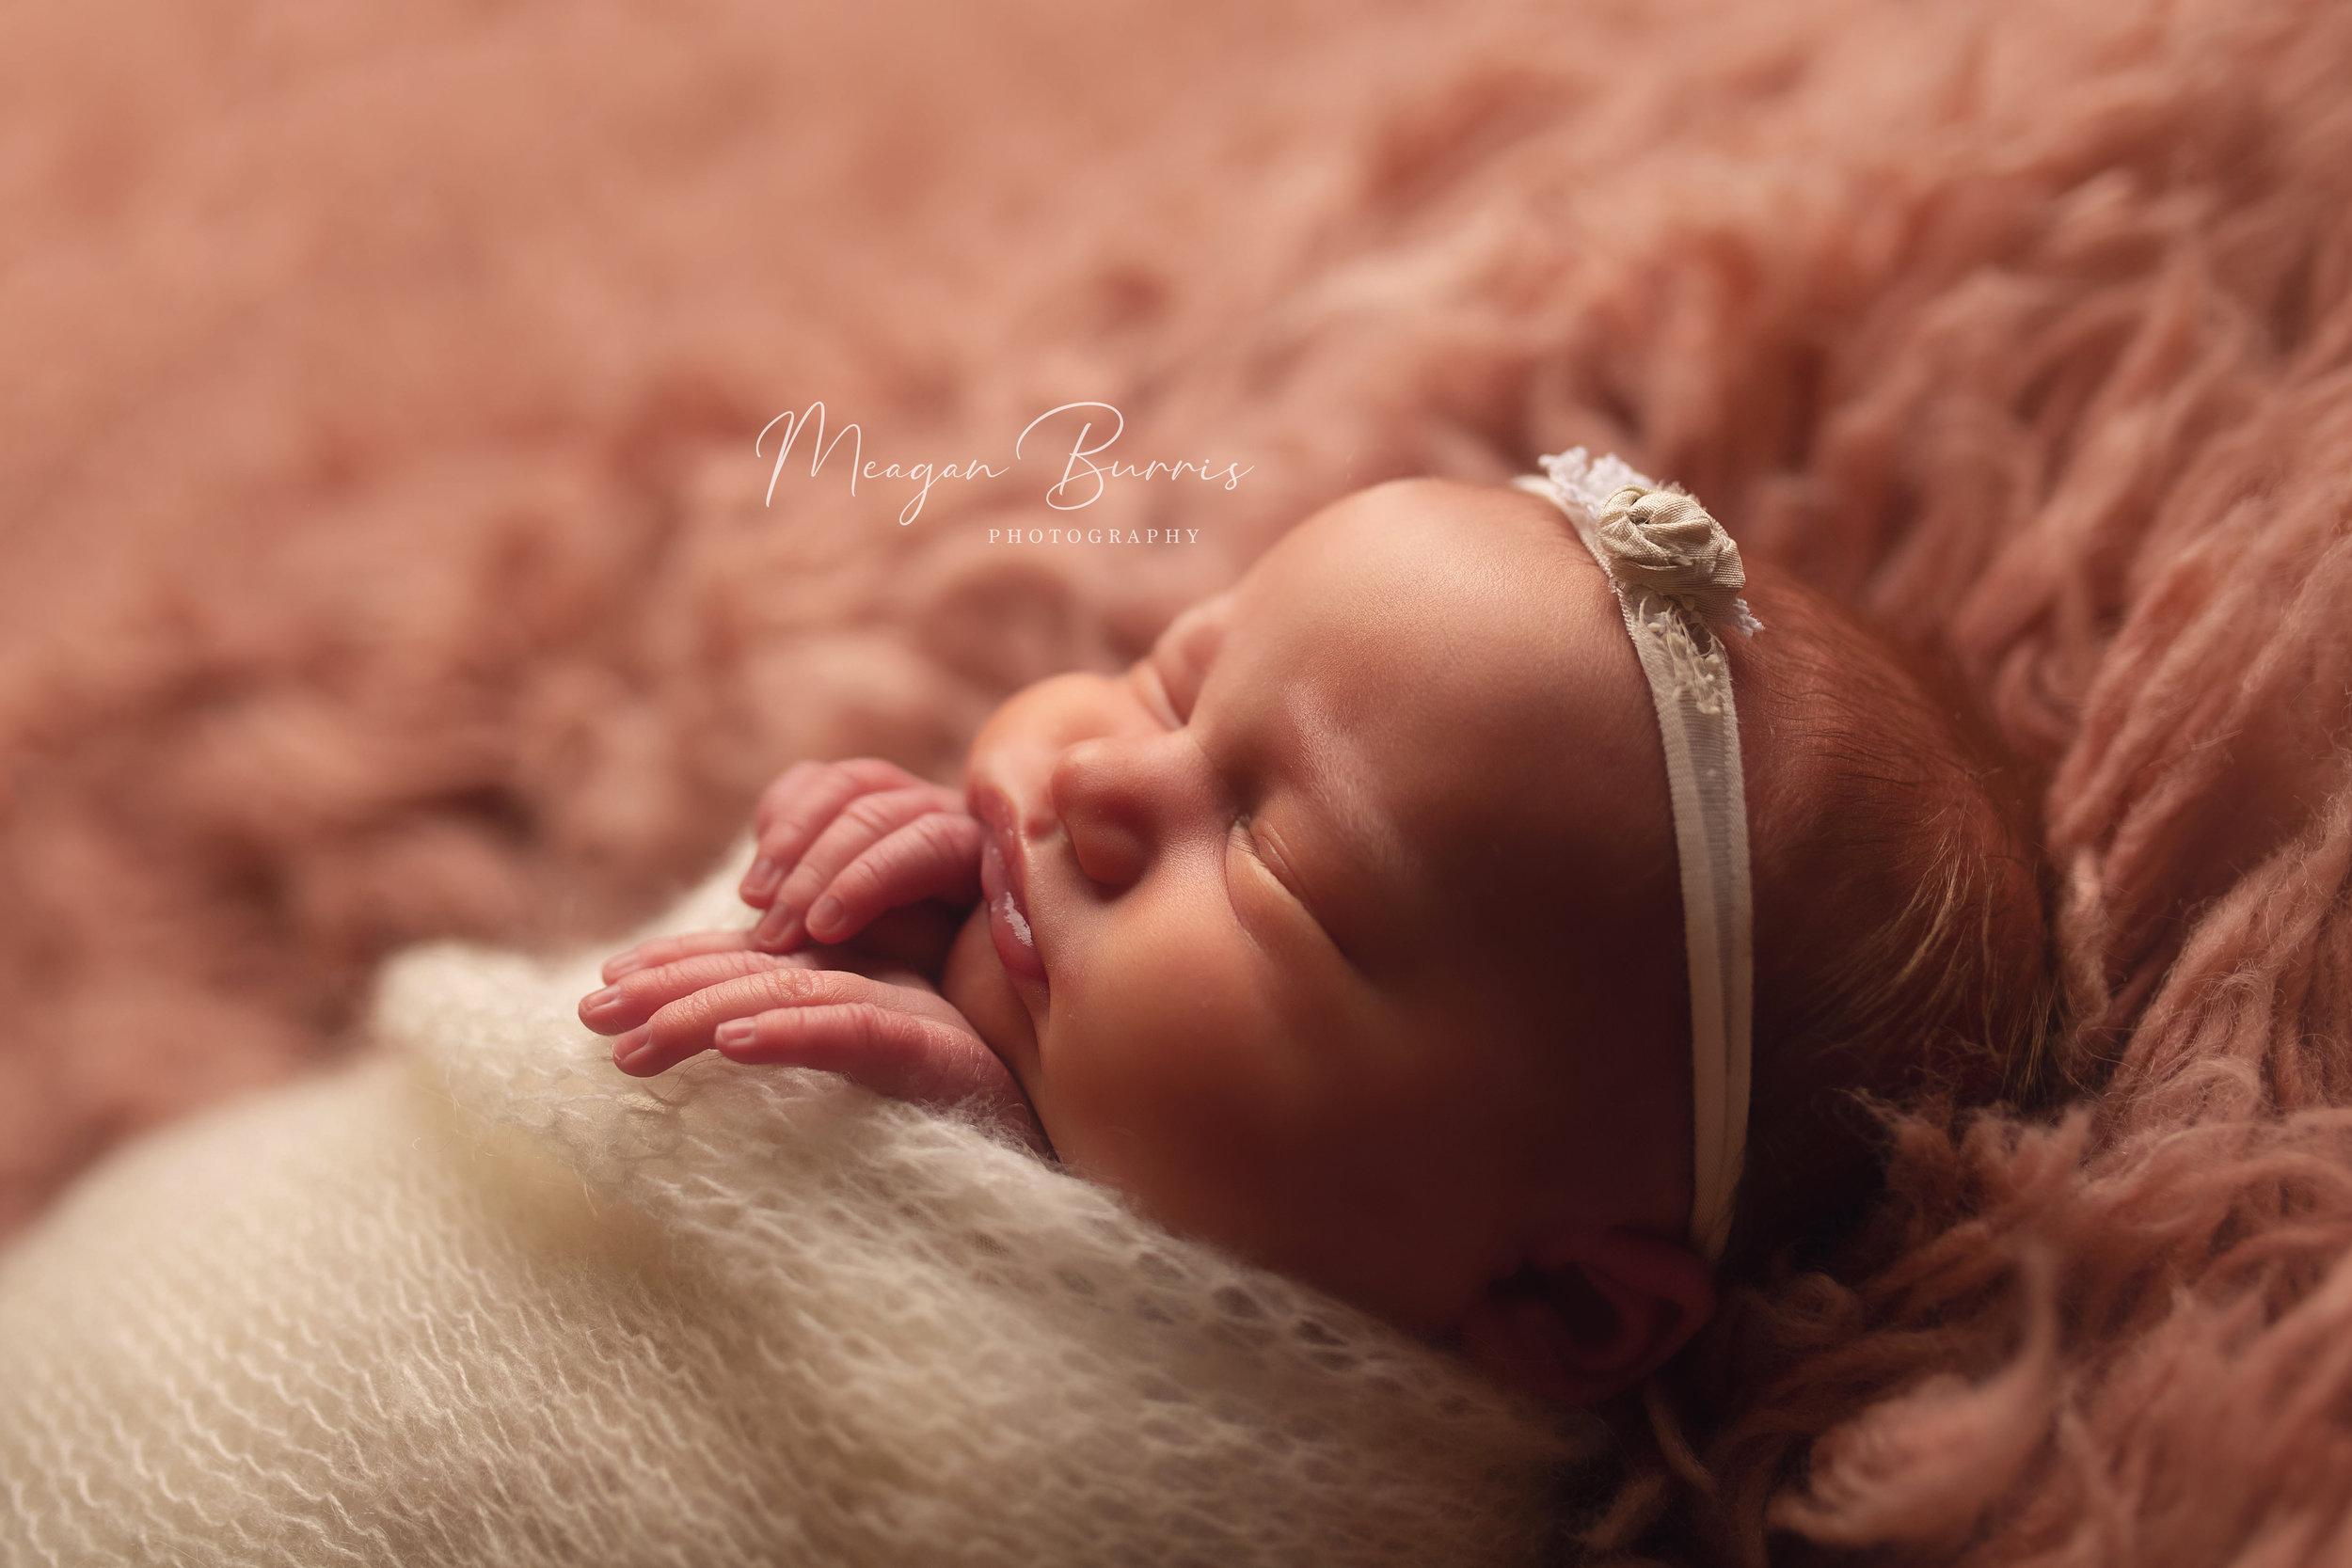 vera_rose_carmel indiana newborn photographer2.jpg